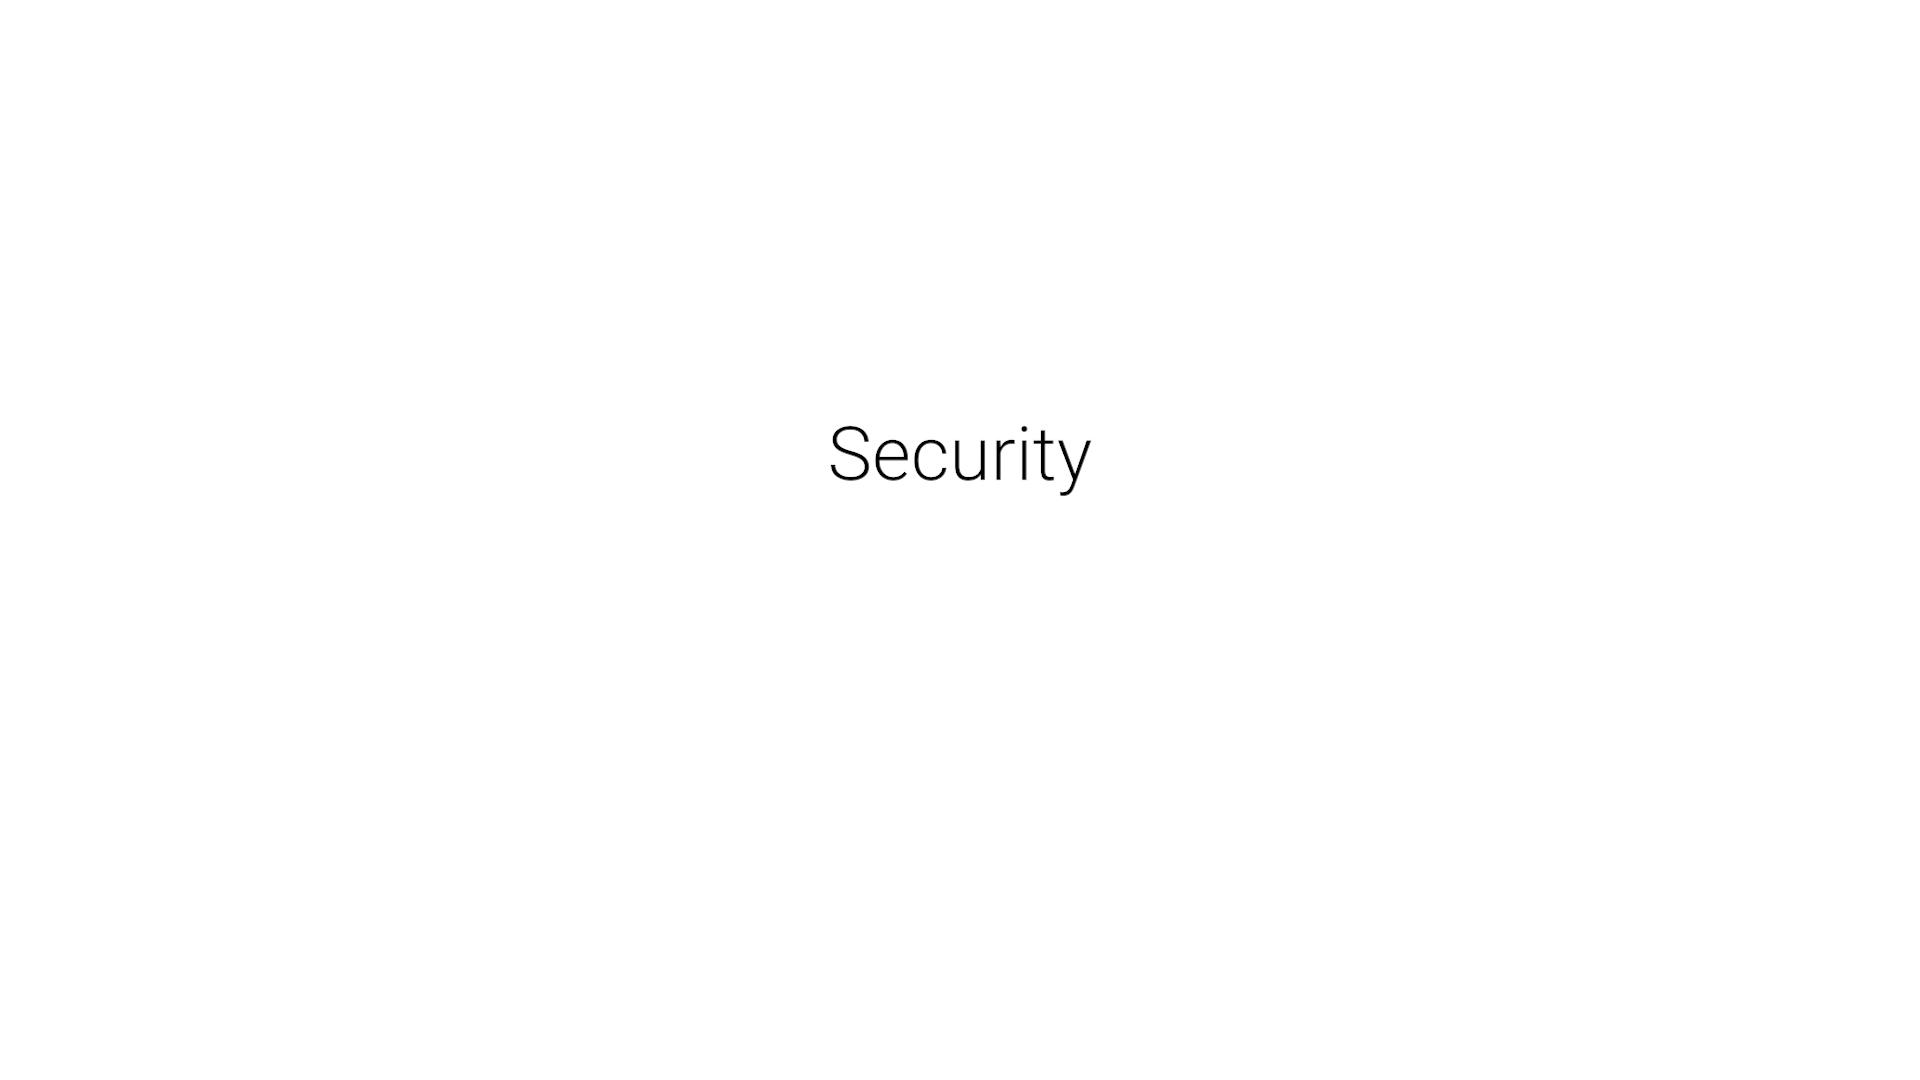 10_Security